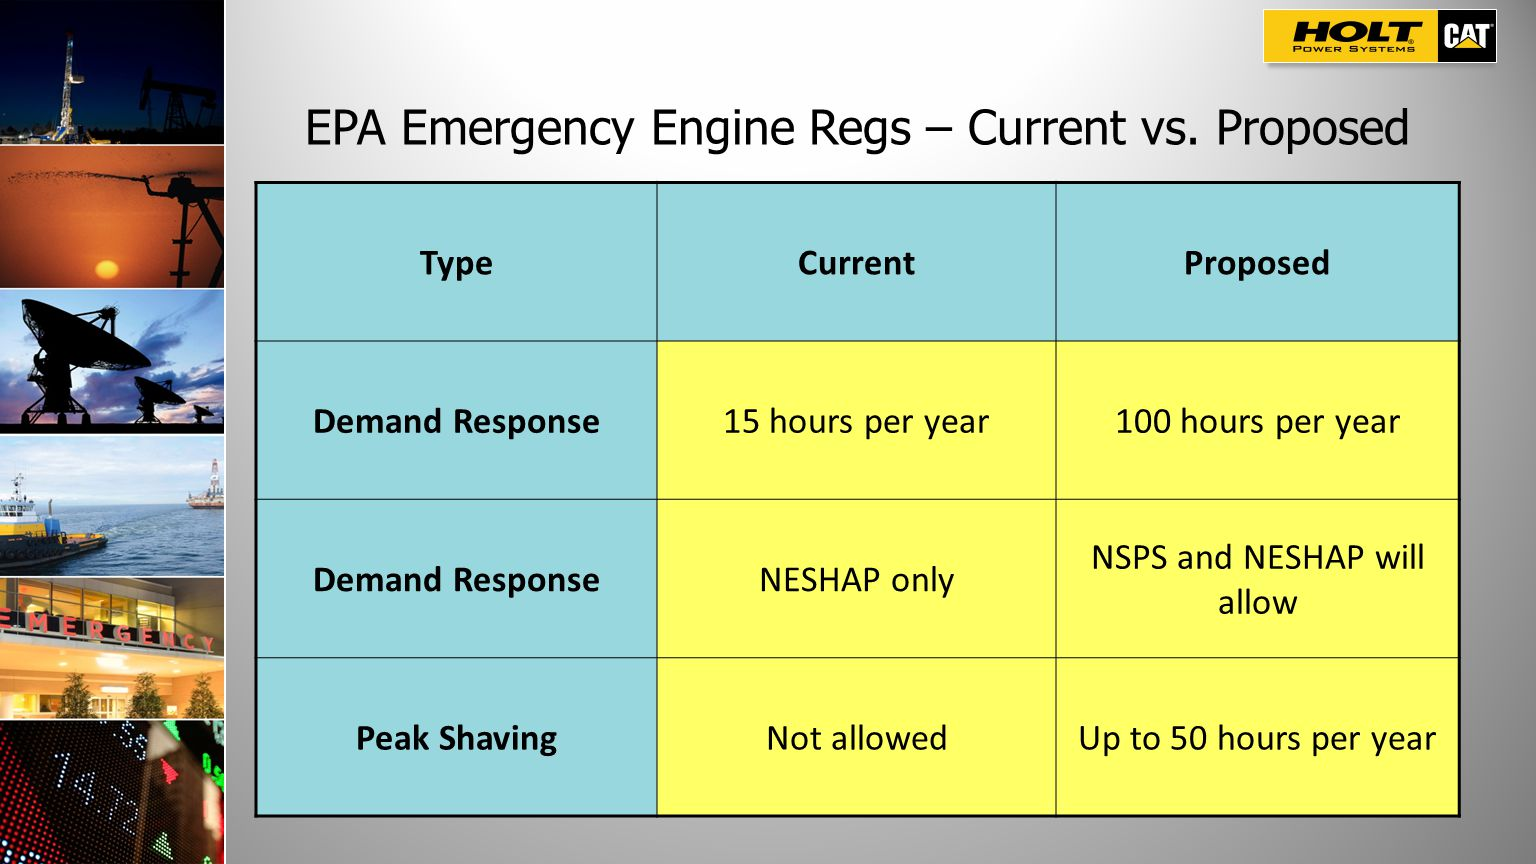 EPA Emergency Engine Regs – Current vs. Proposed